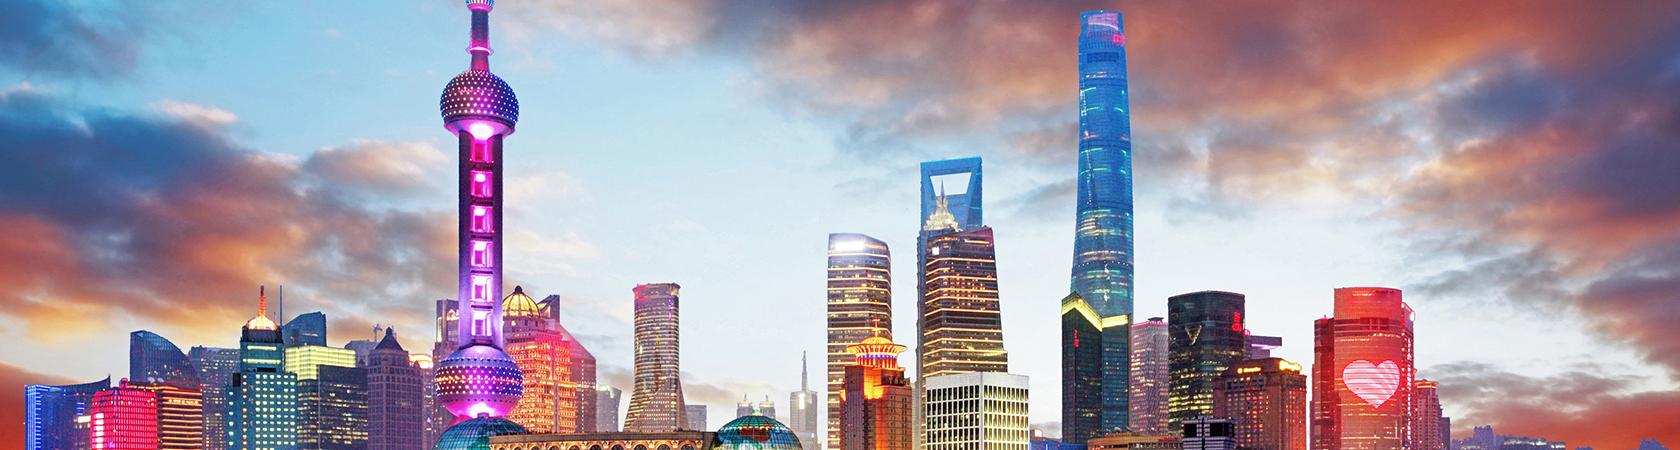 Introduction - MBA Digital Marketing & Business EFAP Shanghai